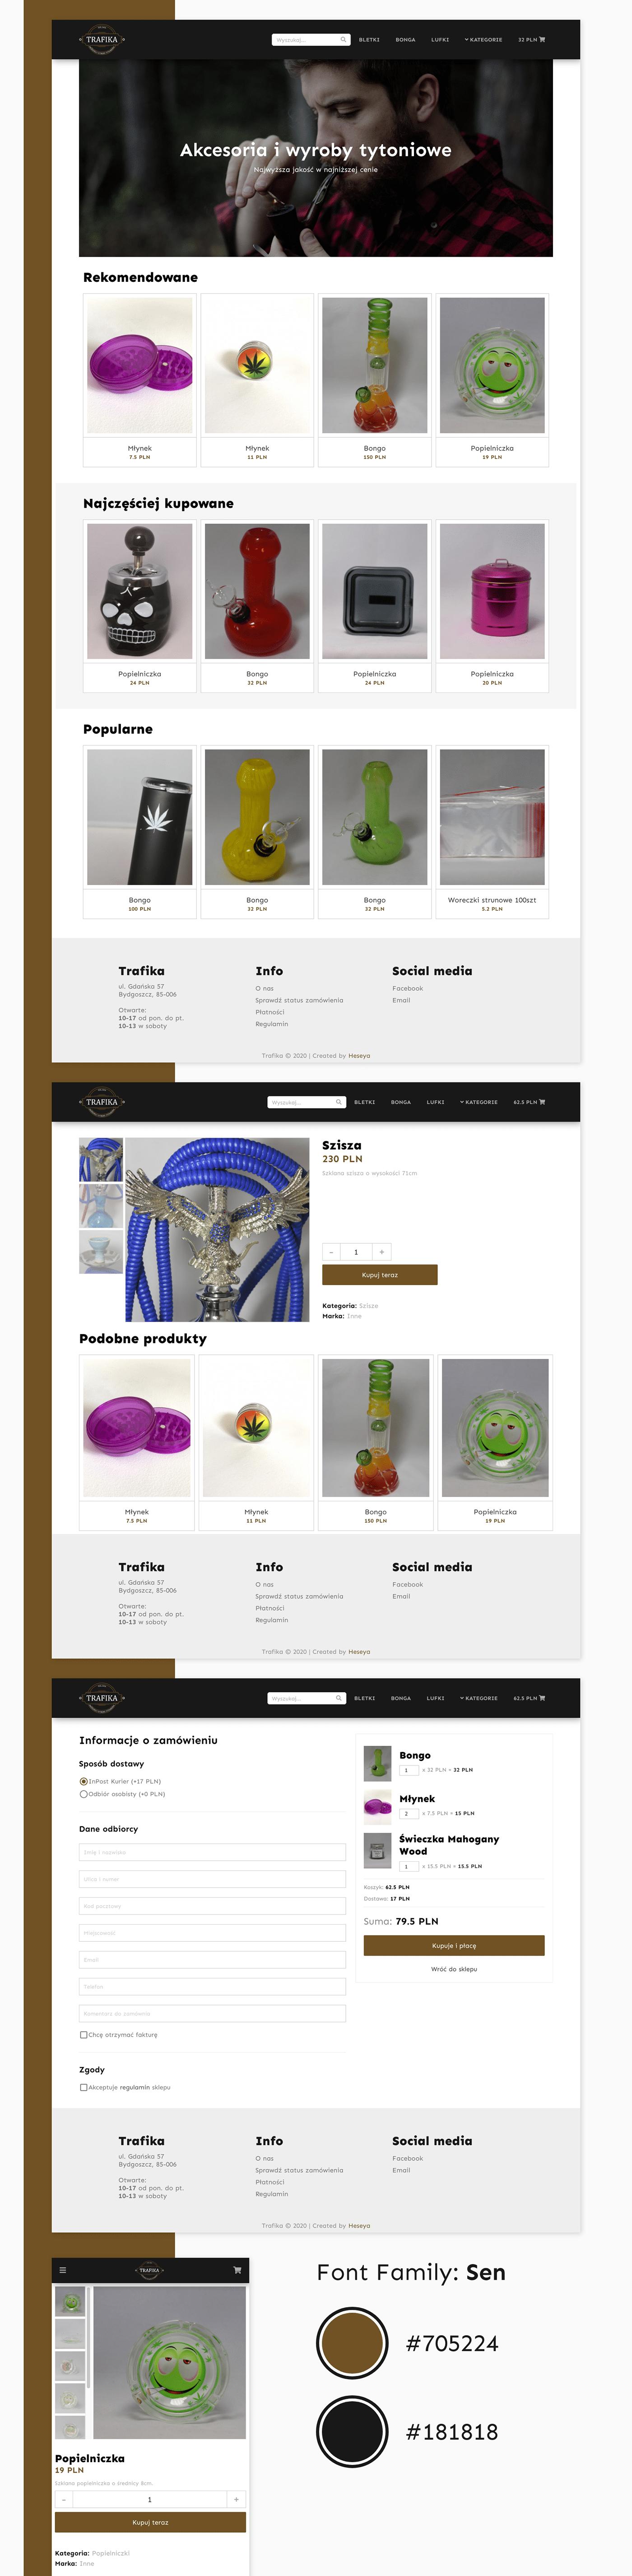 design shop store Tráfika